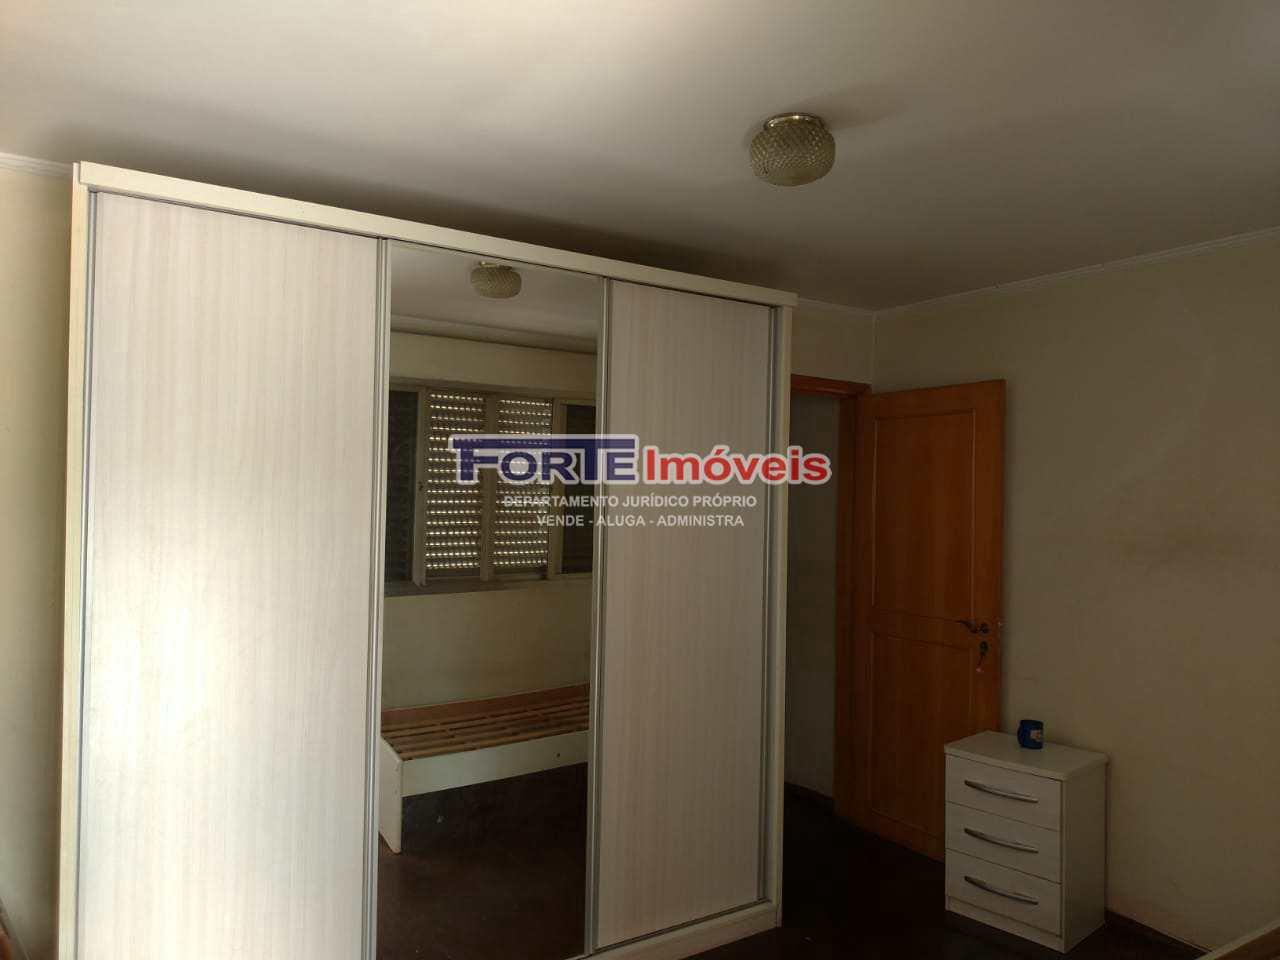 Sobrado com 3 dorms, Vila Primavera, São Paulo - R$ 550 mil, Cod: 42903538